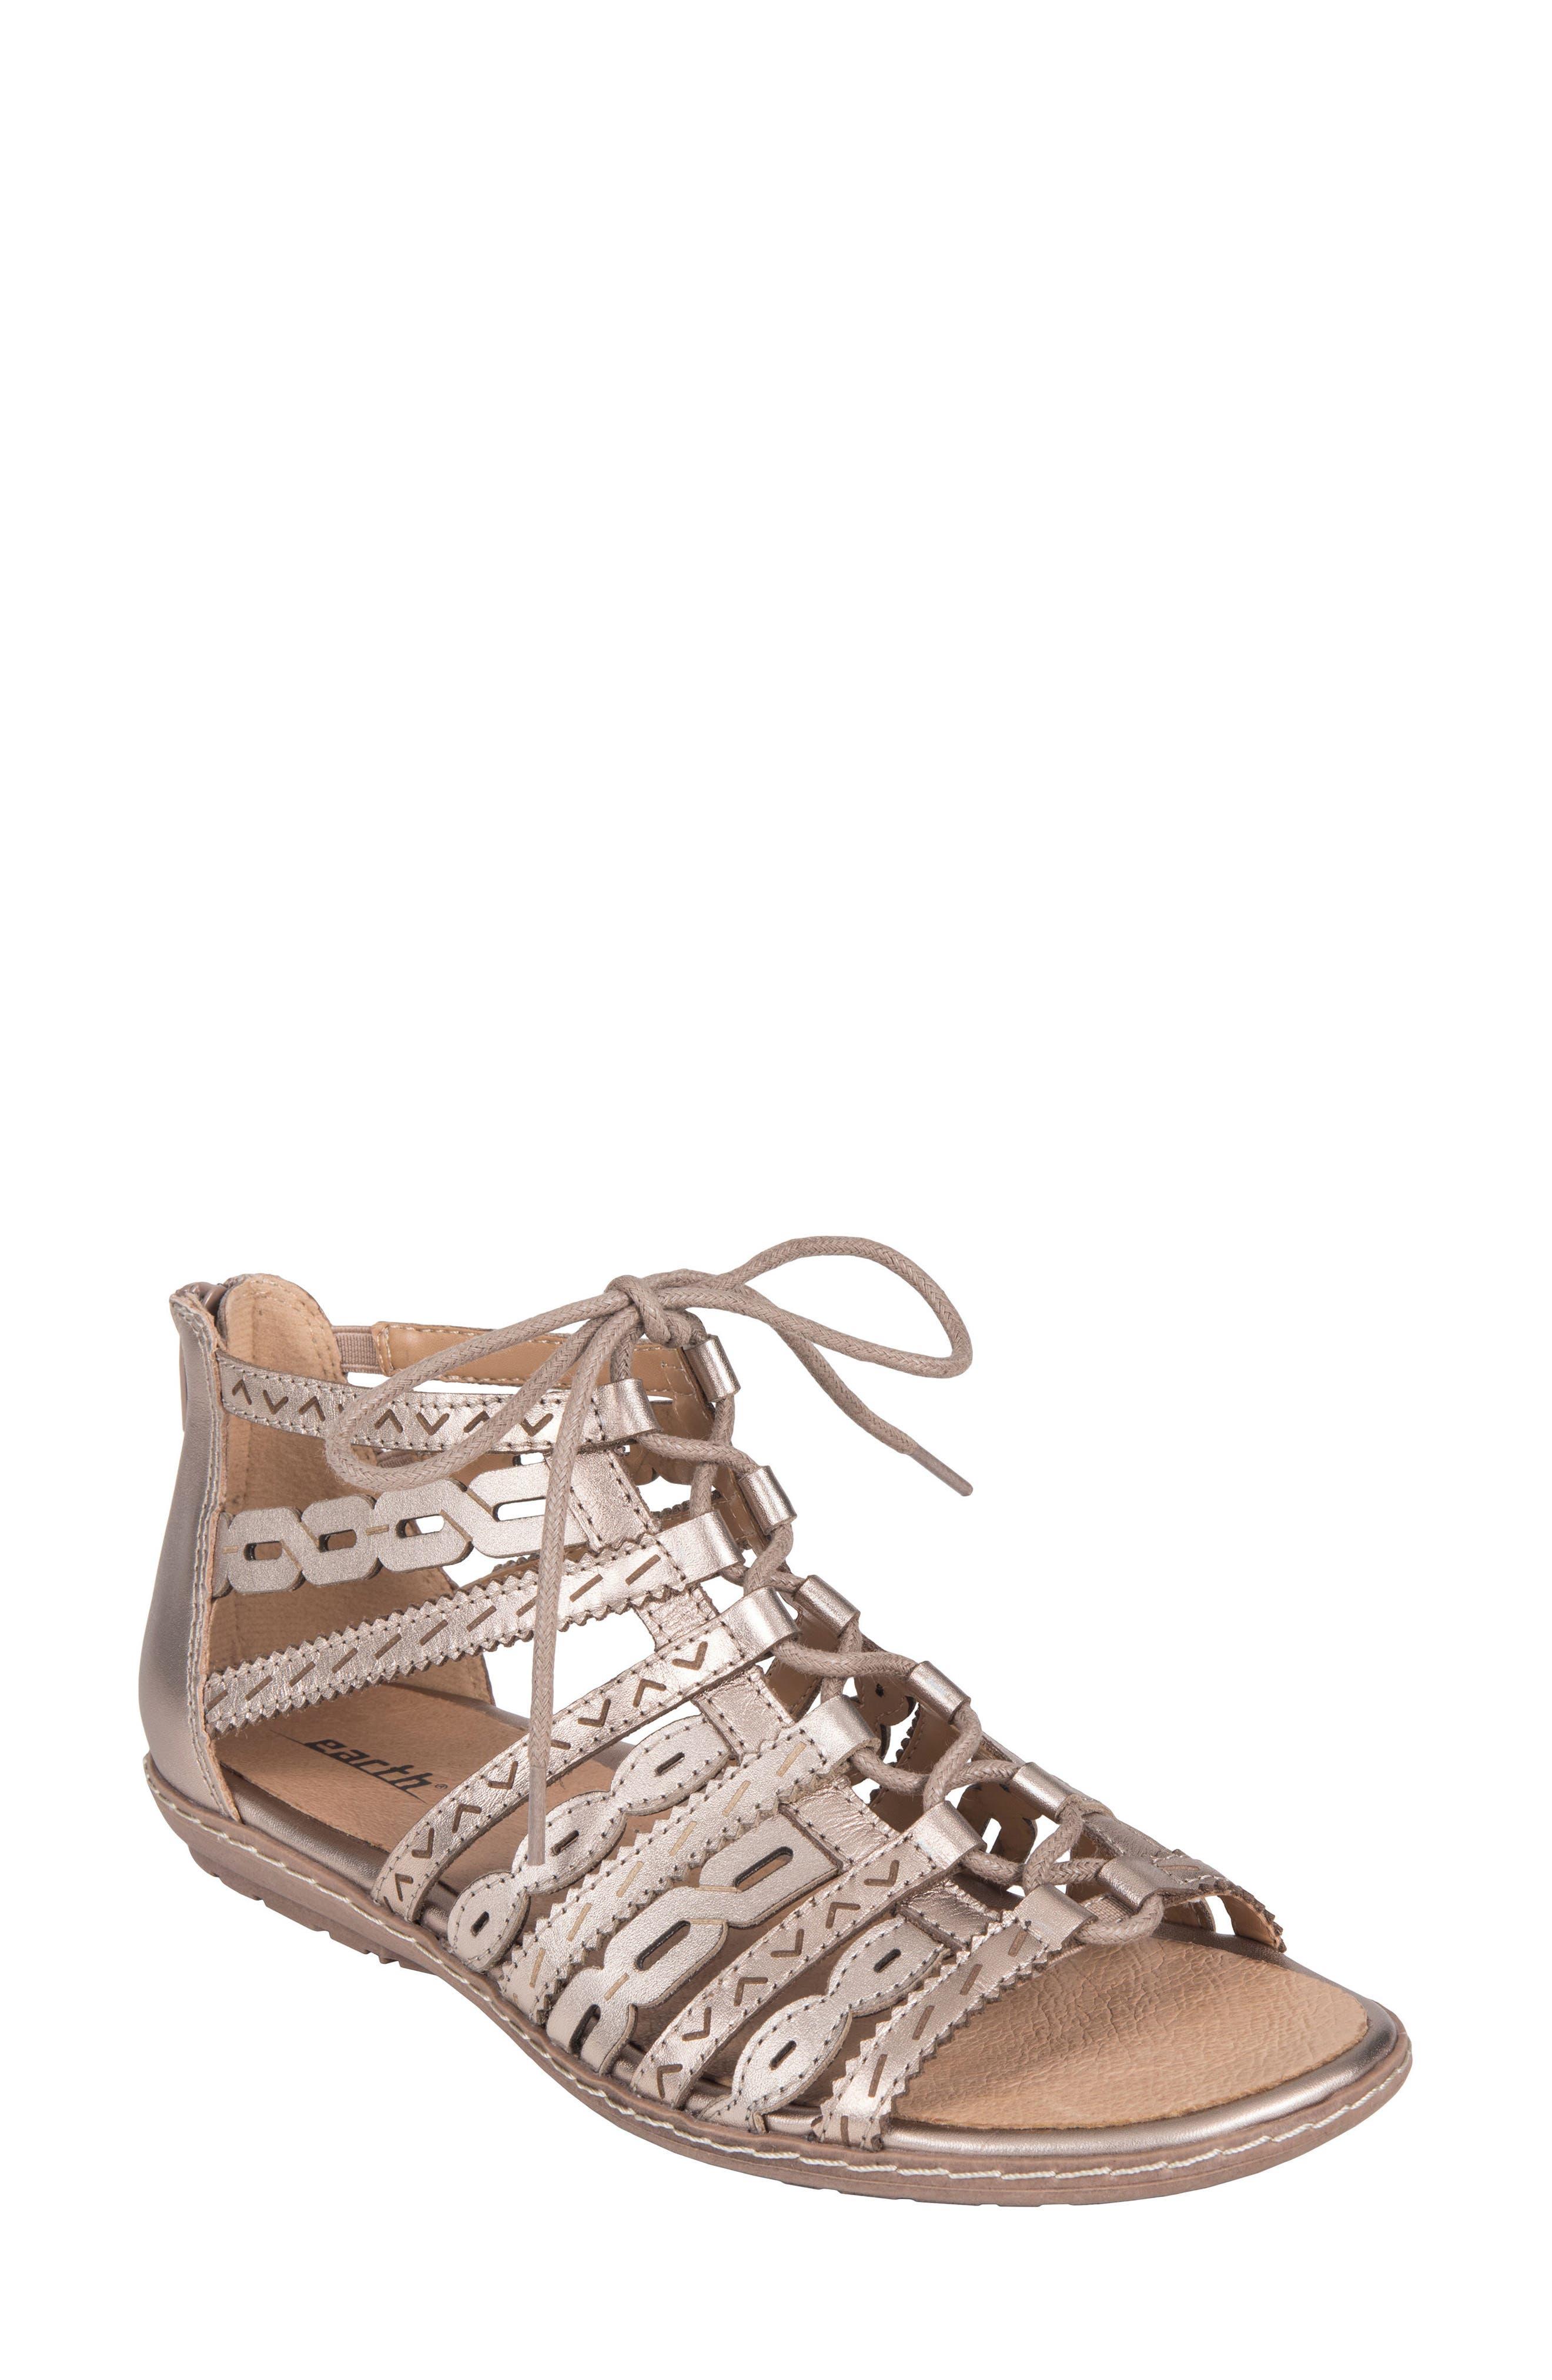 Tidal Mid Top Ghillie Sandal,                             Main thumbnail 1, color,                             Titanium Leather